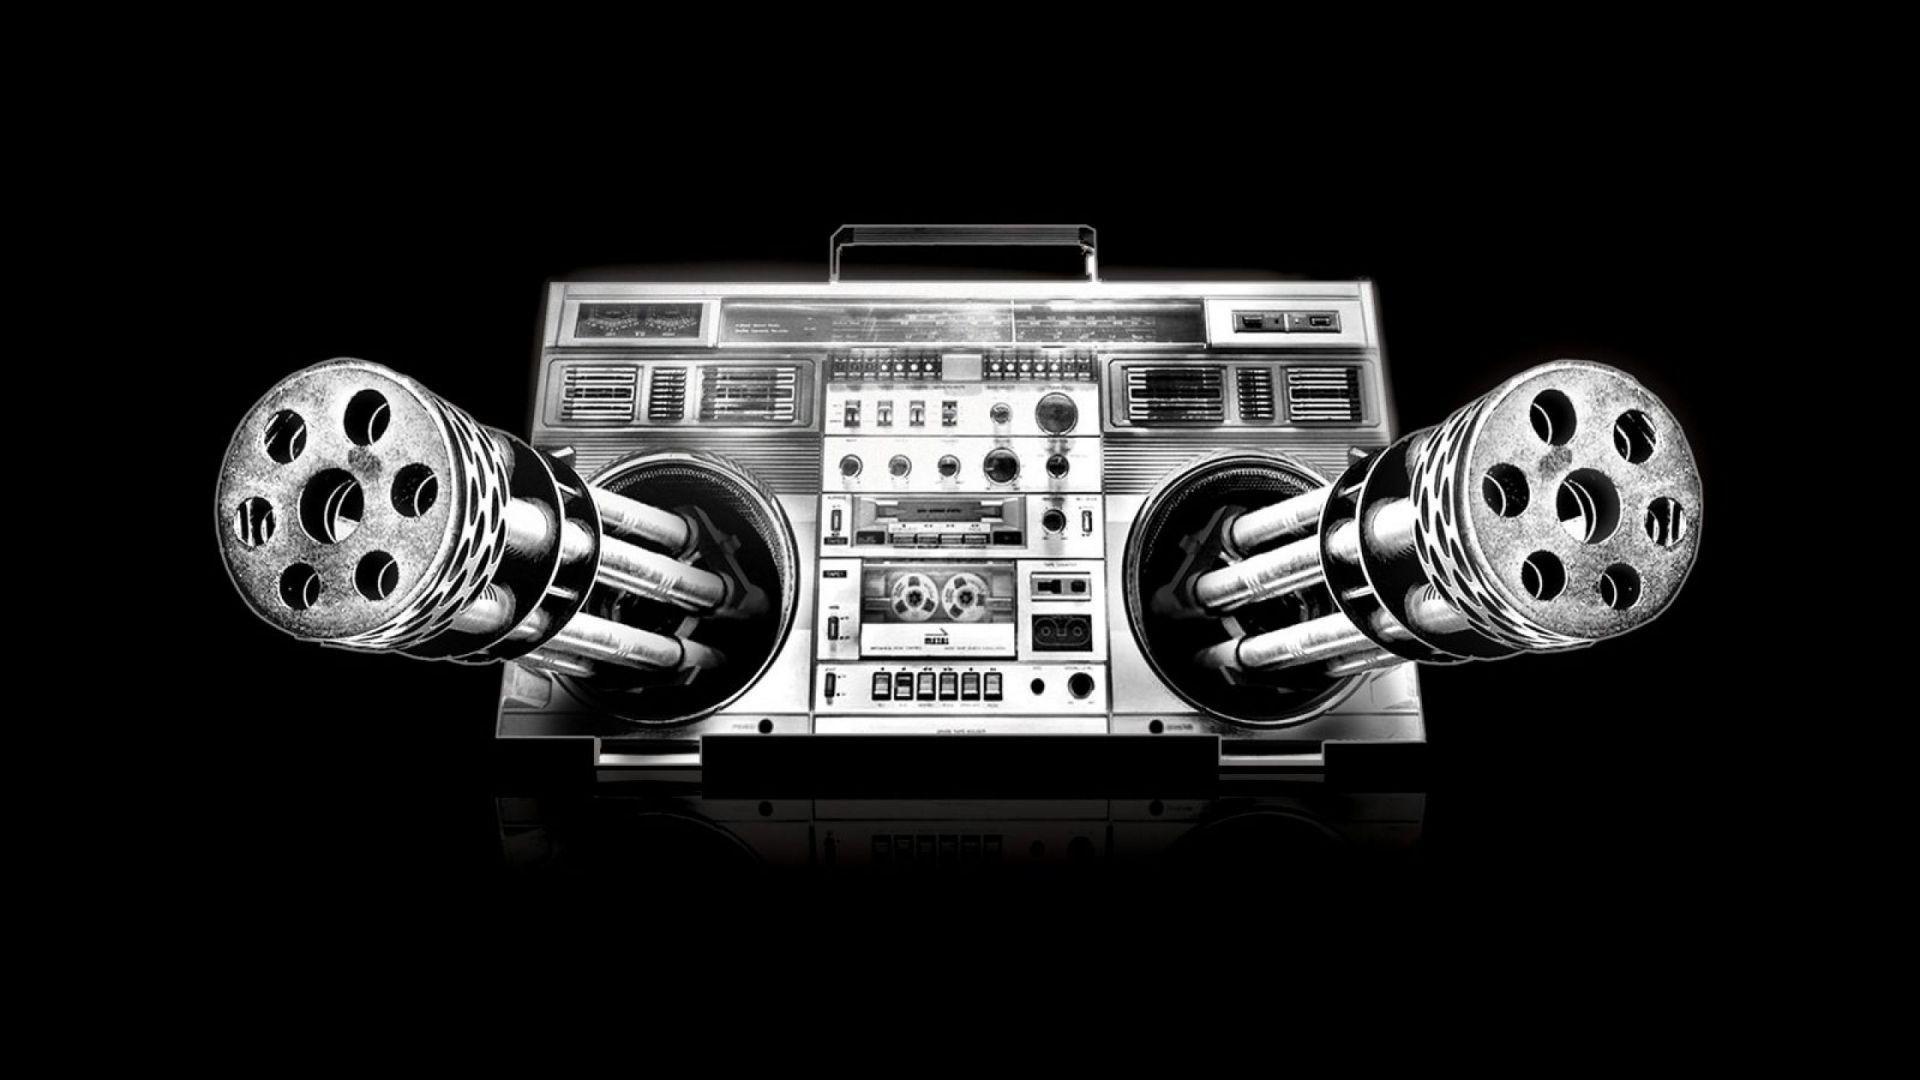 Rapper machine gun kelly mgk celebrity hip hop hd wallpapers mgk rapper machine gun kelly mgk celebrity hip hop hd wallpapers voltagebd Gallery